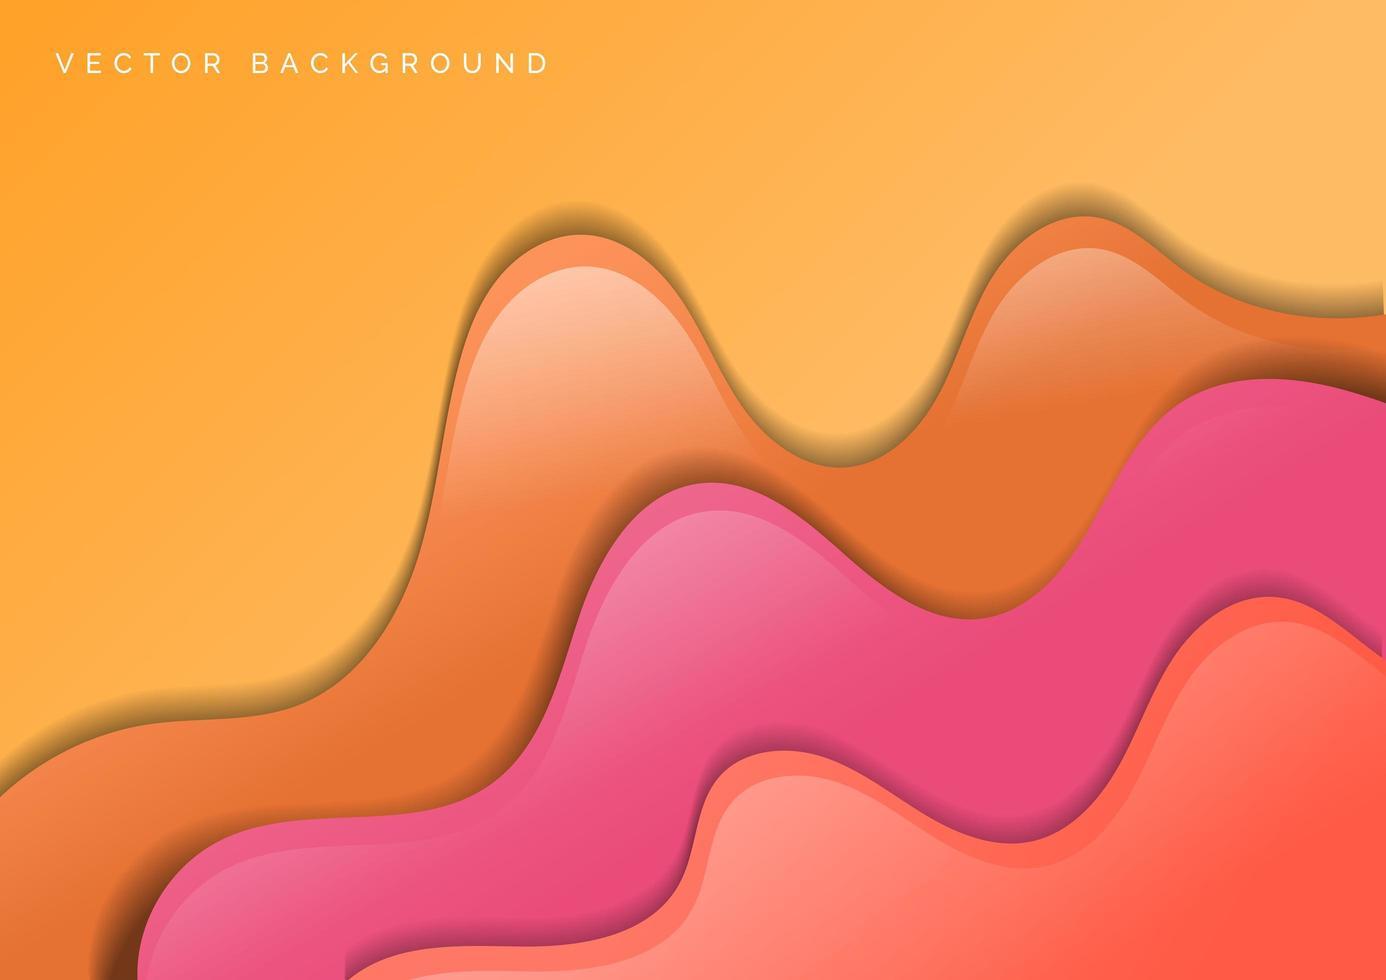 papel laranja e rosa abstrato cortado fundo ondulado vetor